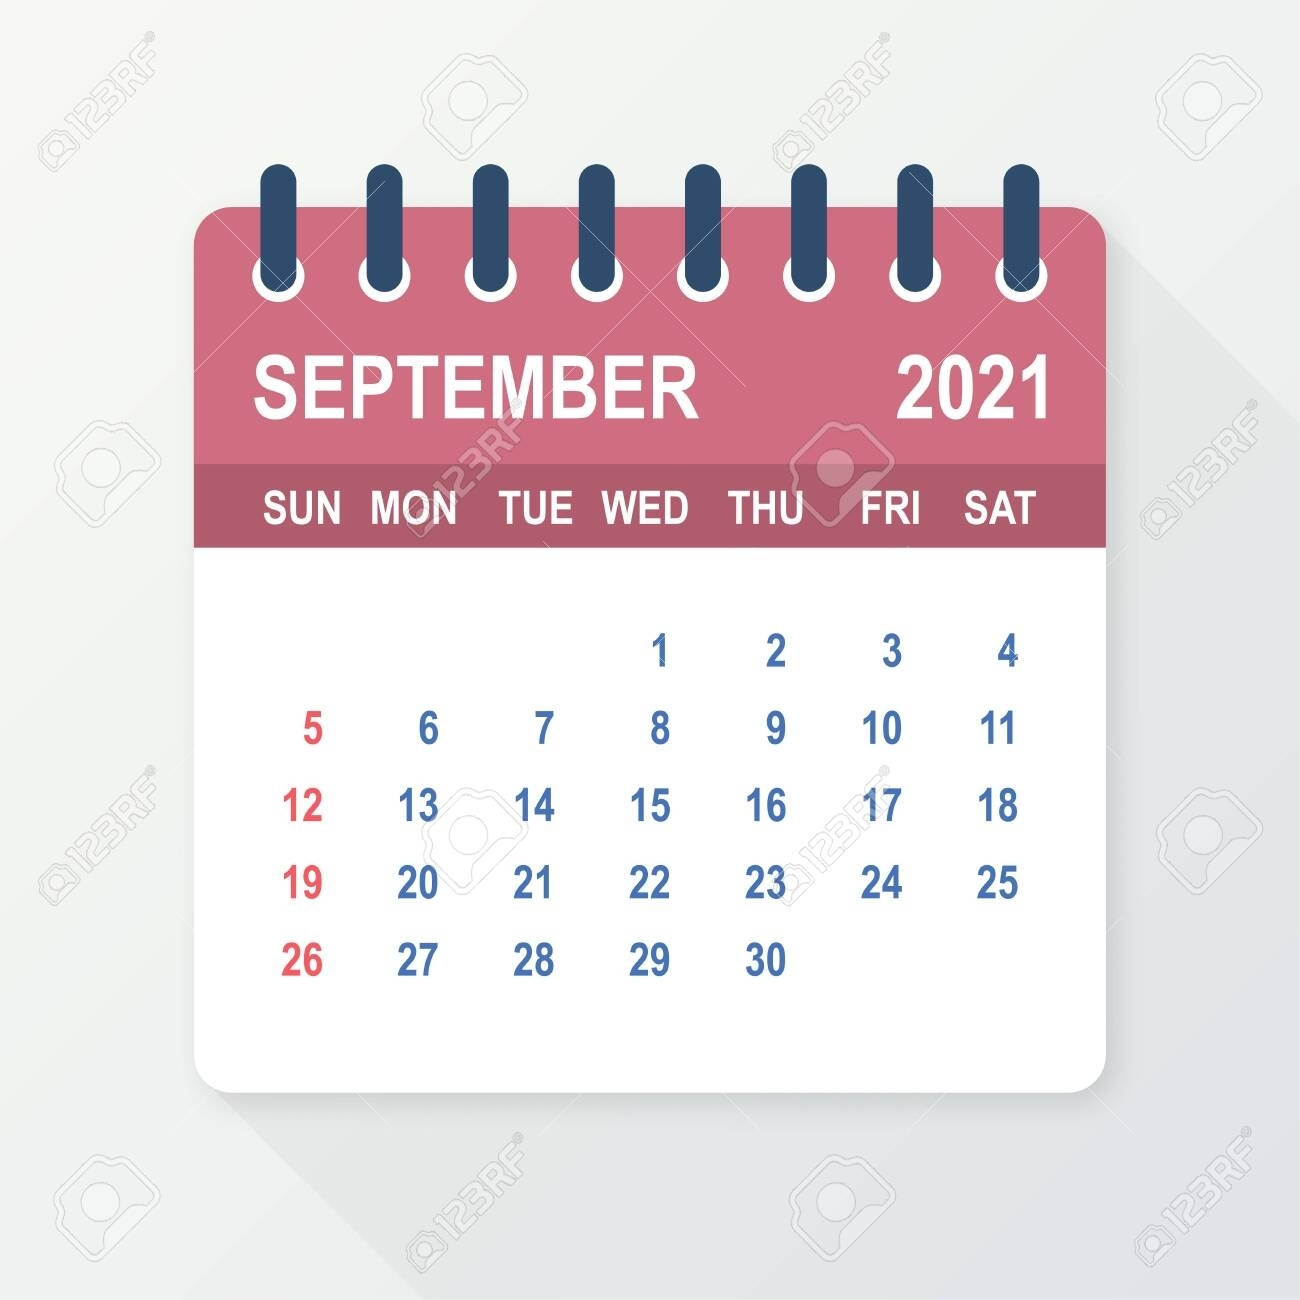 Get Clip Art September 2021